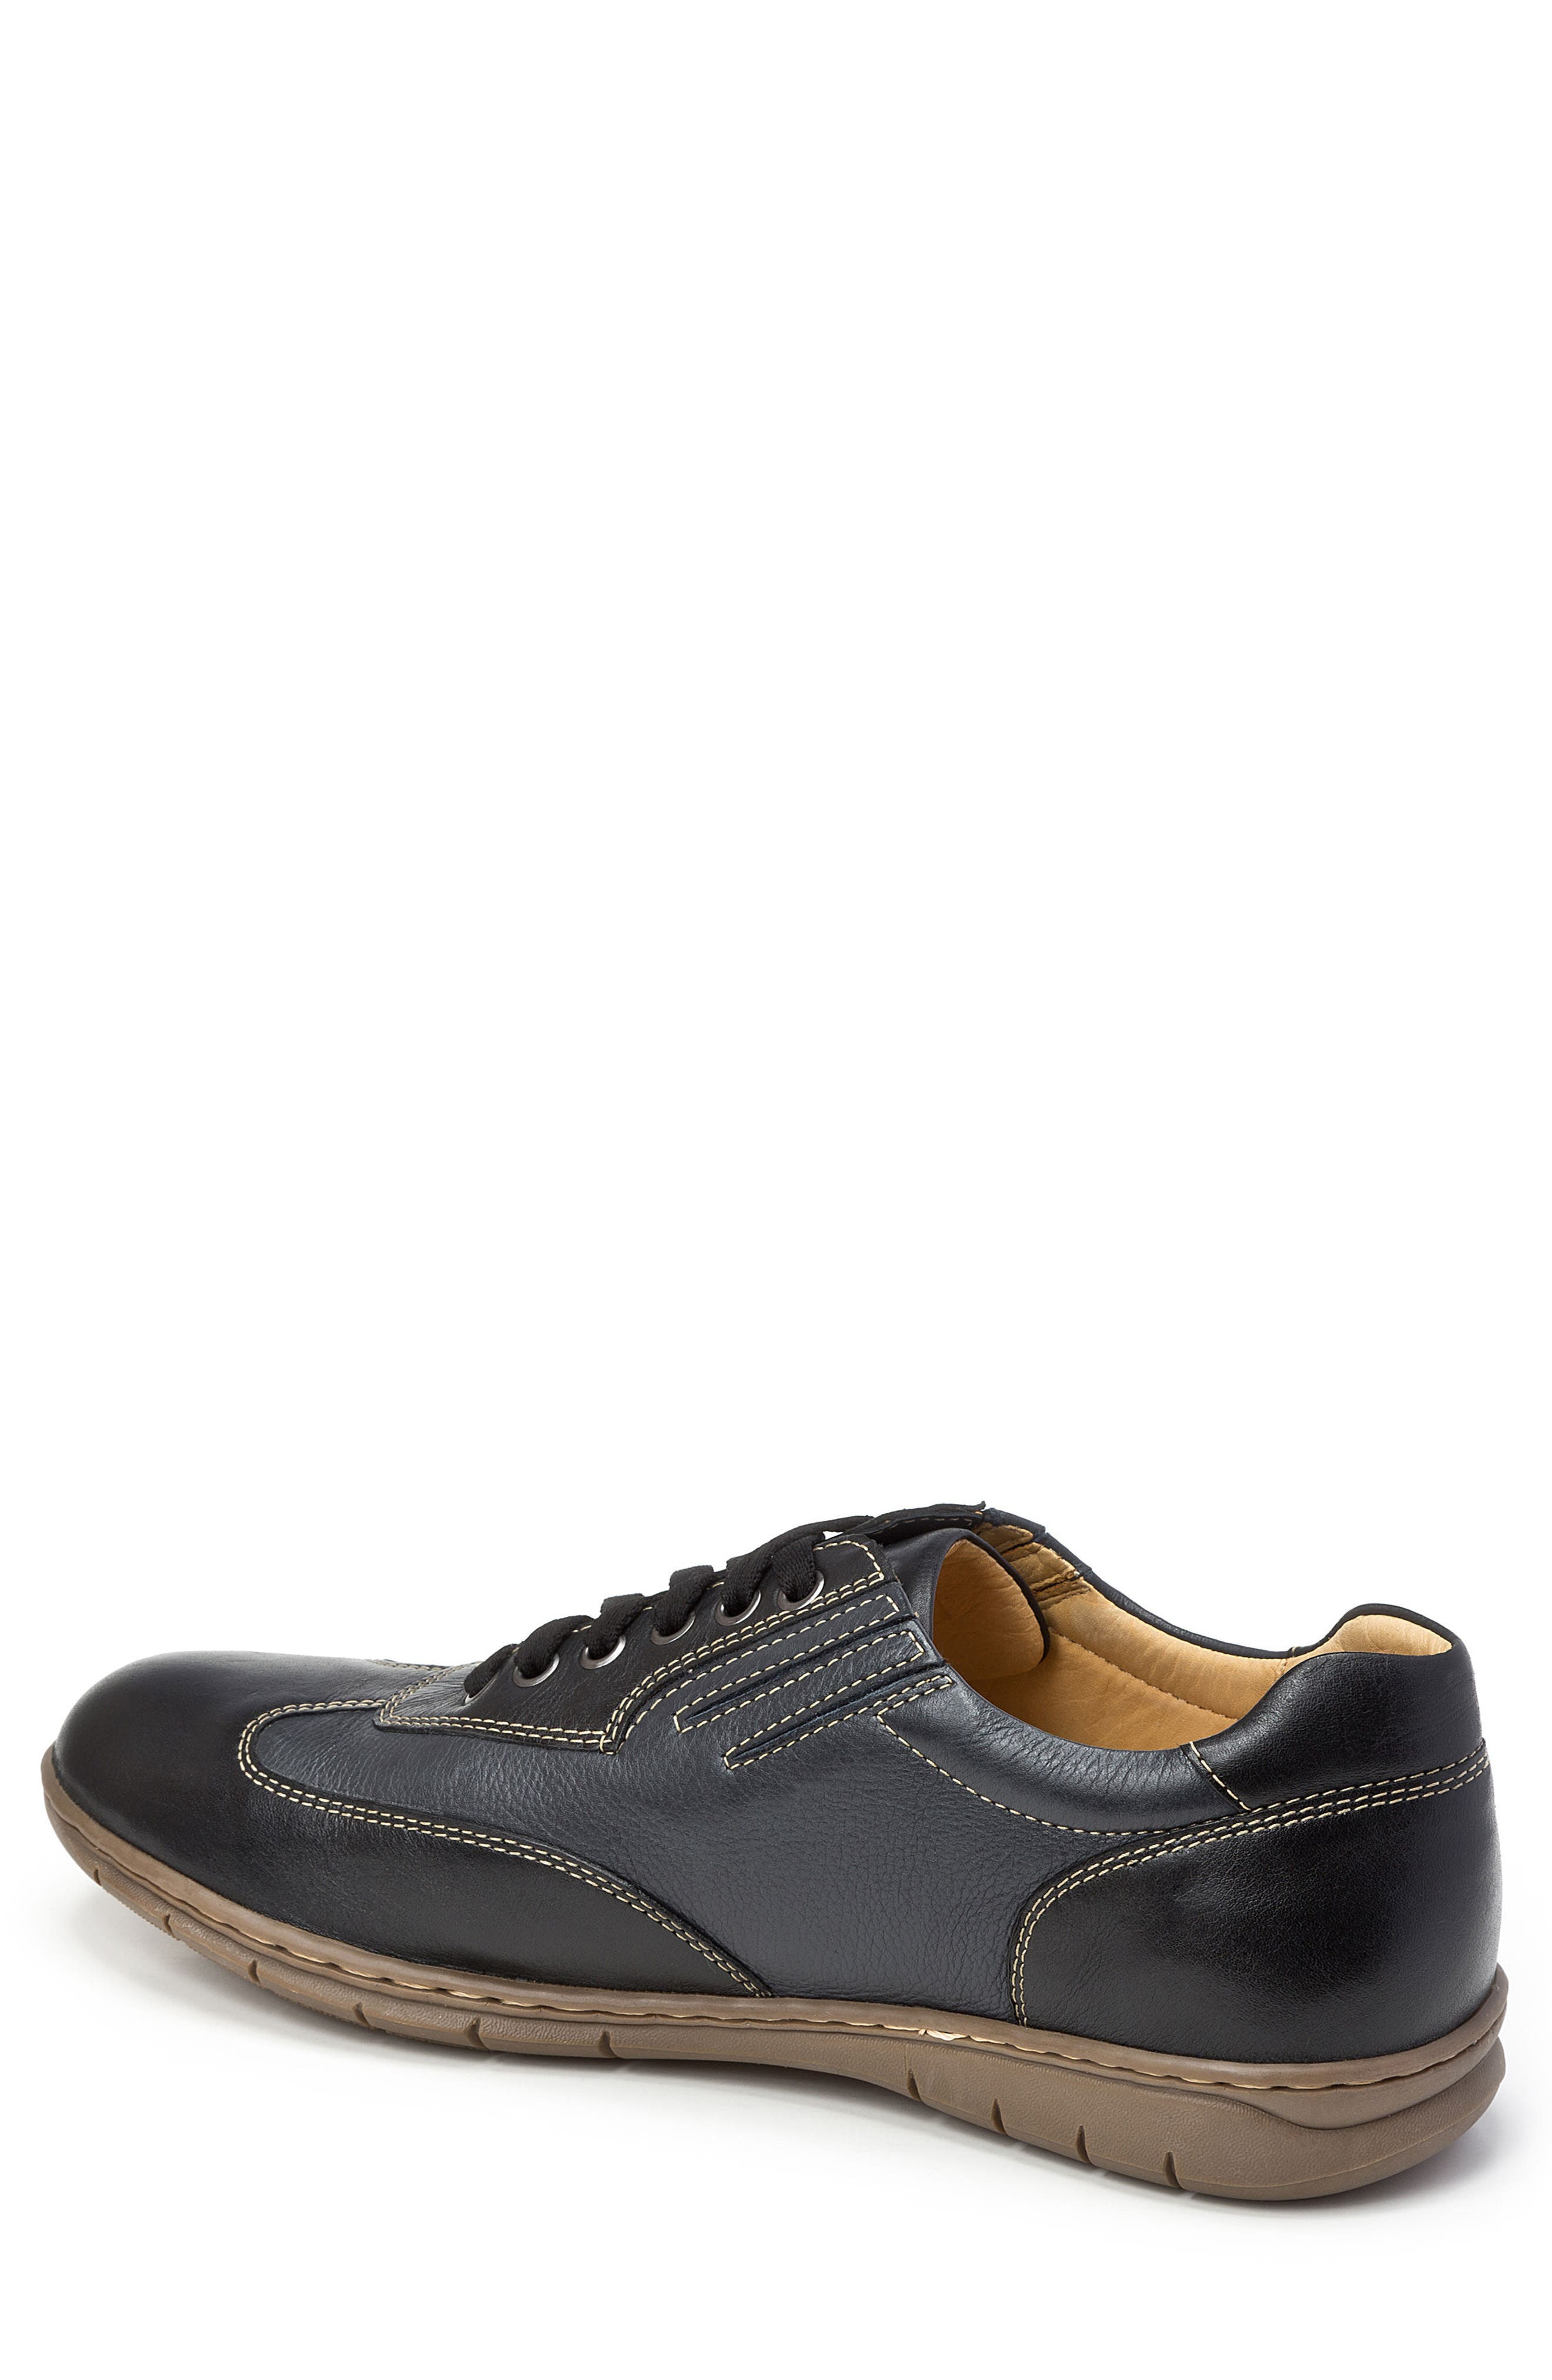 Vernon Sneaker,                             Alternate thumbnail 2, color,                             Black Leather